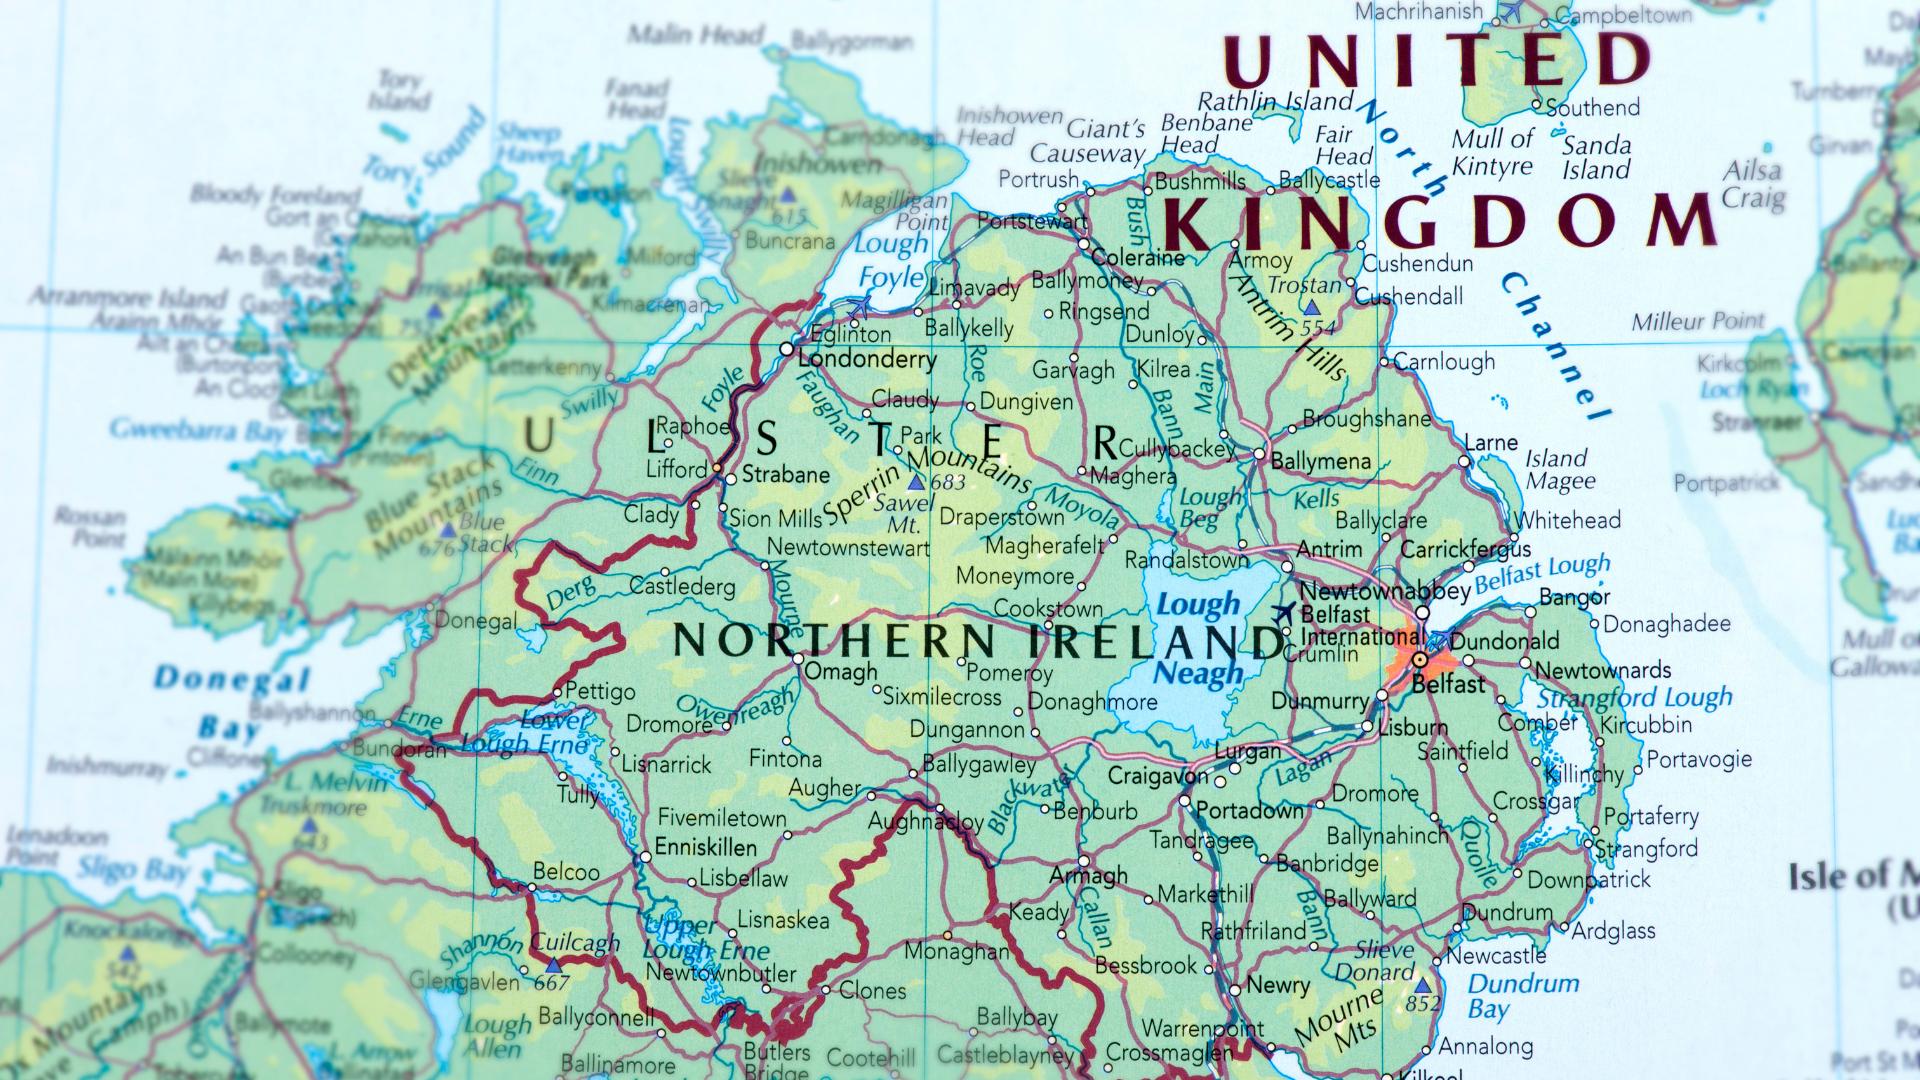 Around 1.6million people in Northern Ireland use Google search every single day. Northern Ireland Marketing agency - Digital Marketing Belfast - Paul Malone